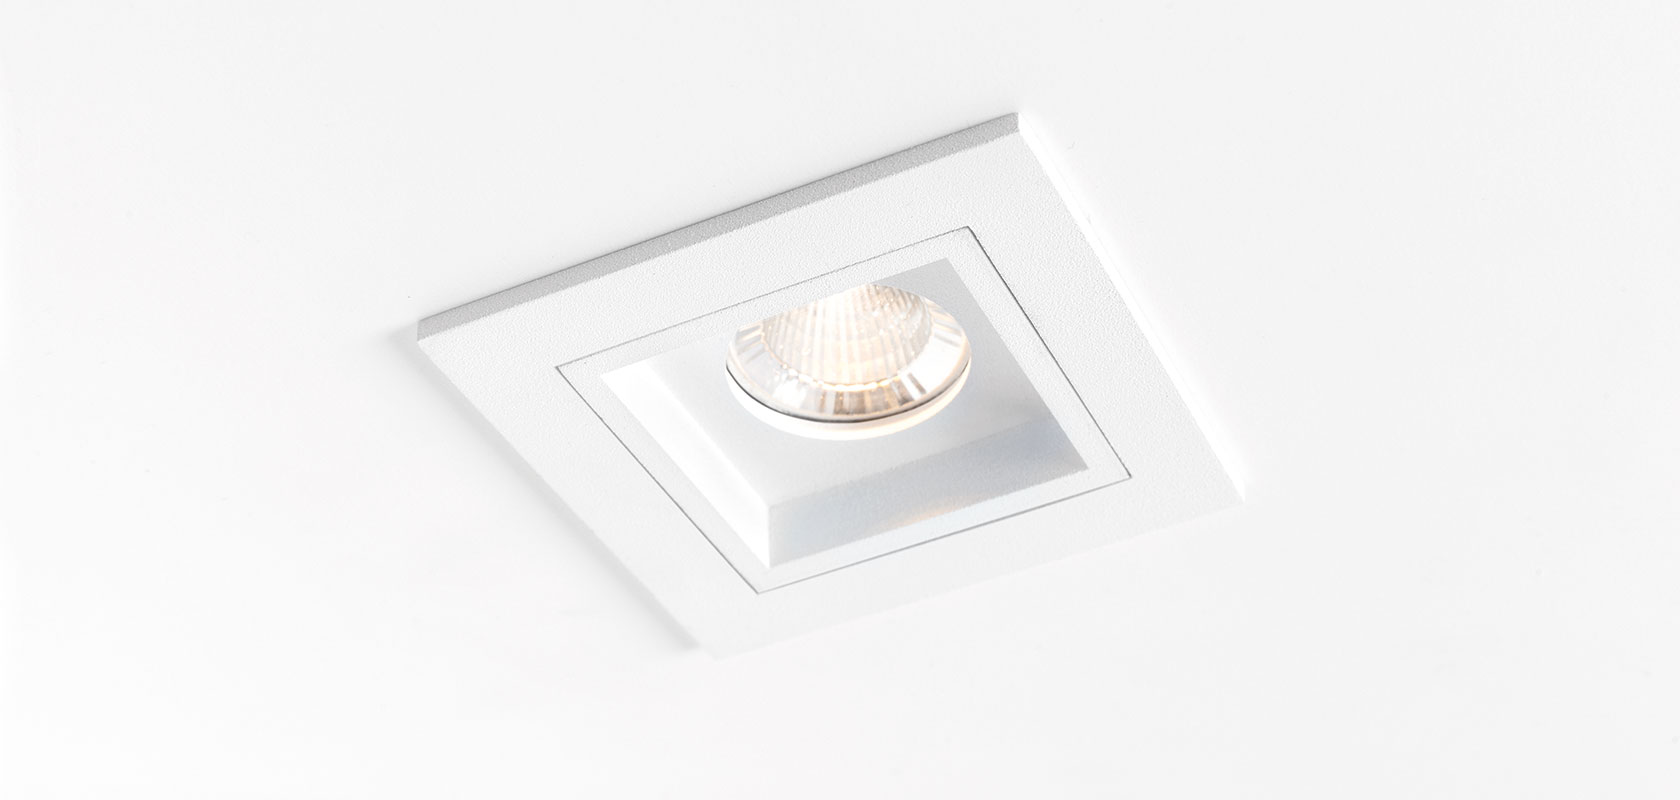 Qbini square in LED 2700K, 40°, 3/4,3W, 294/392lm, 350/500mA, CRI92, IP54, valge moodul ilma raamita